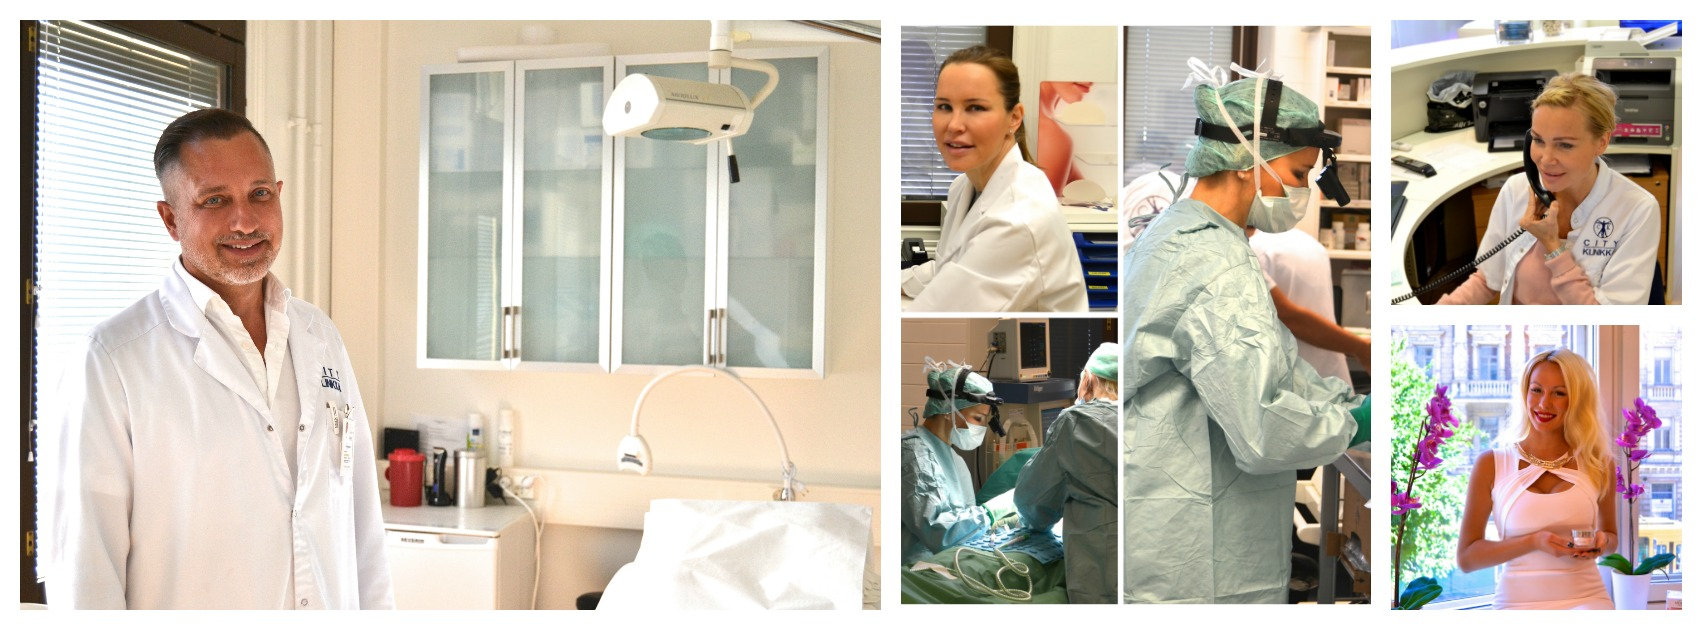 Piotr Sikorski Laser and Health Academy